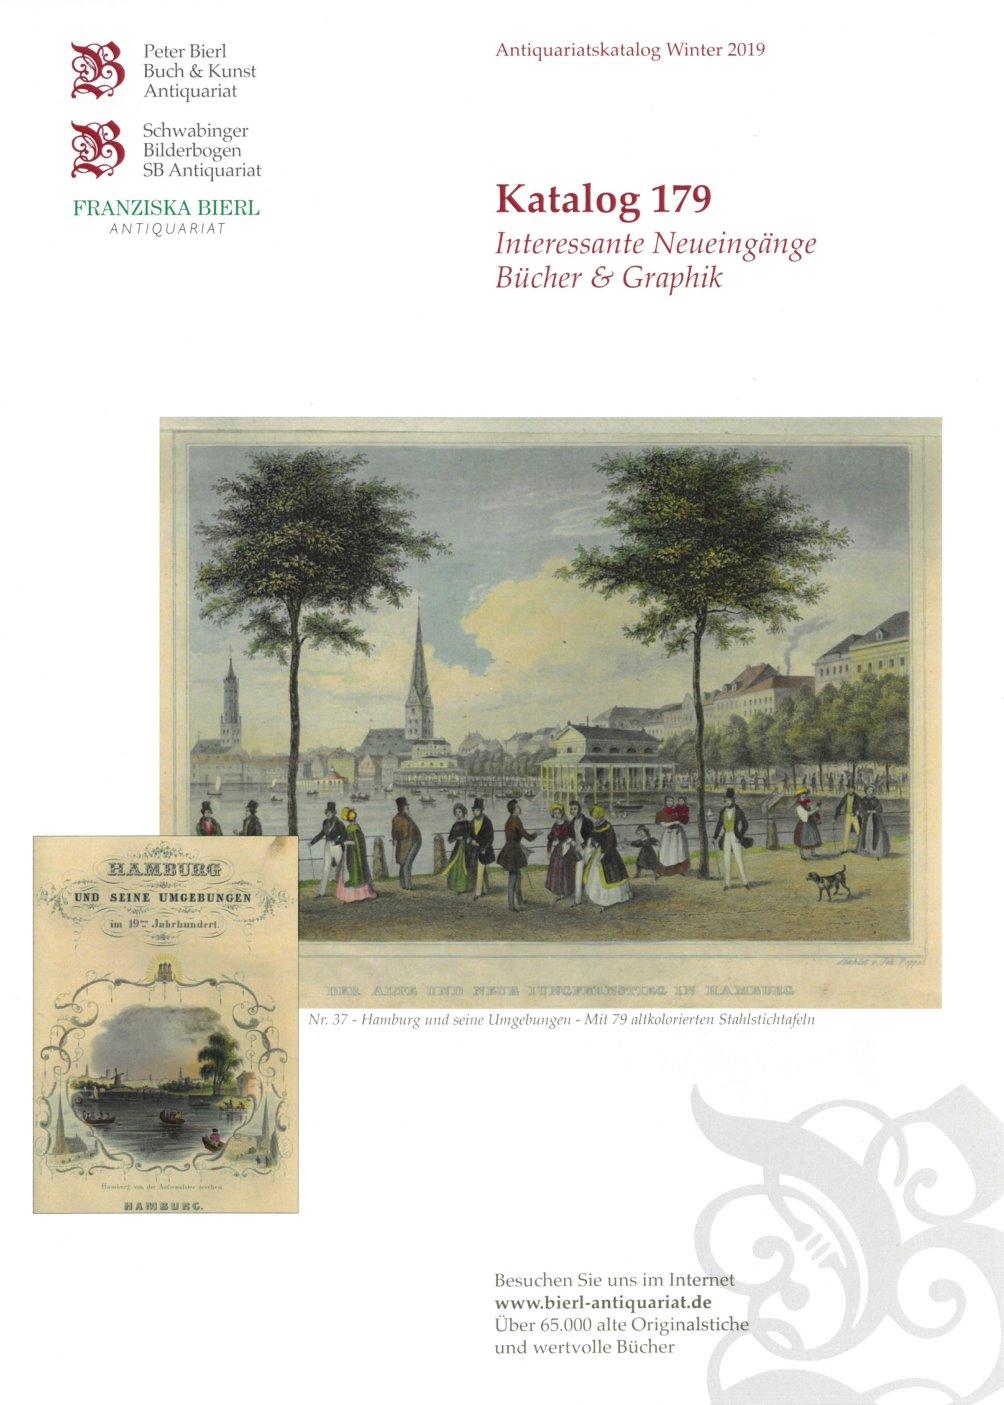 Katalog 179 - Interessante Neueingänge